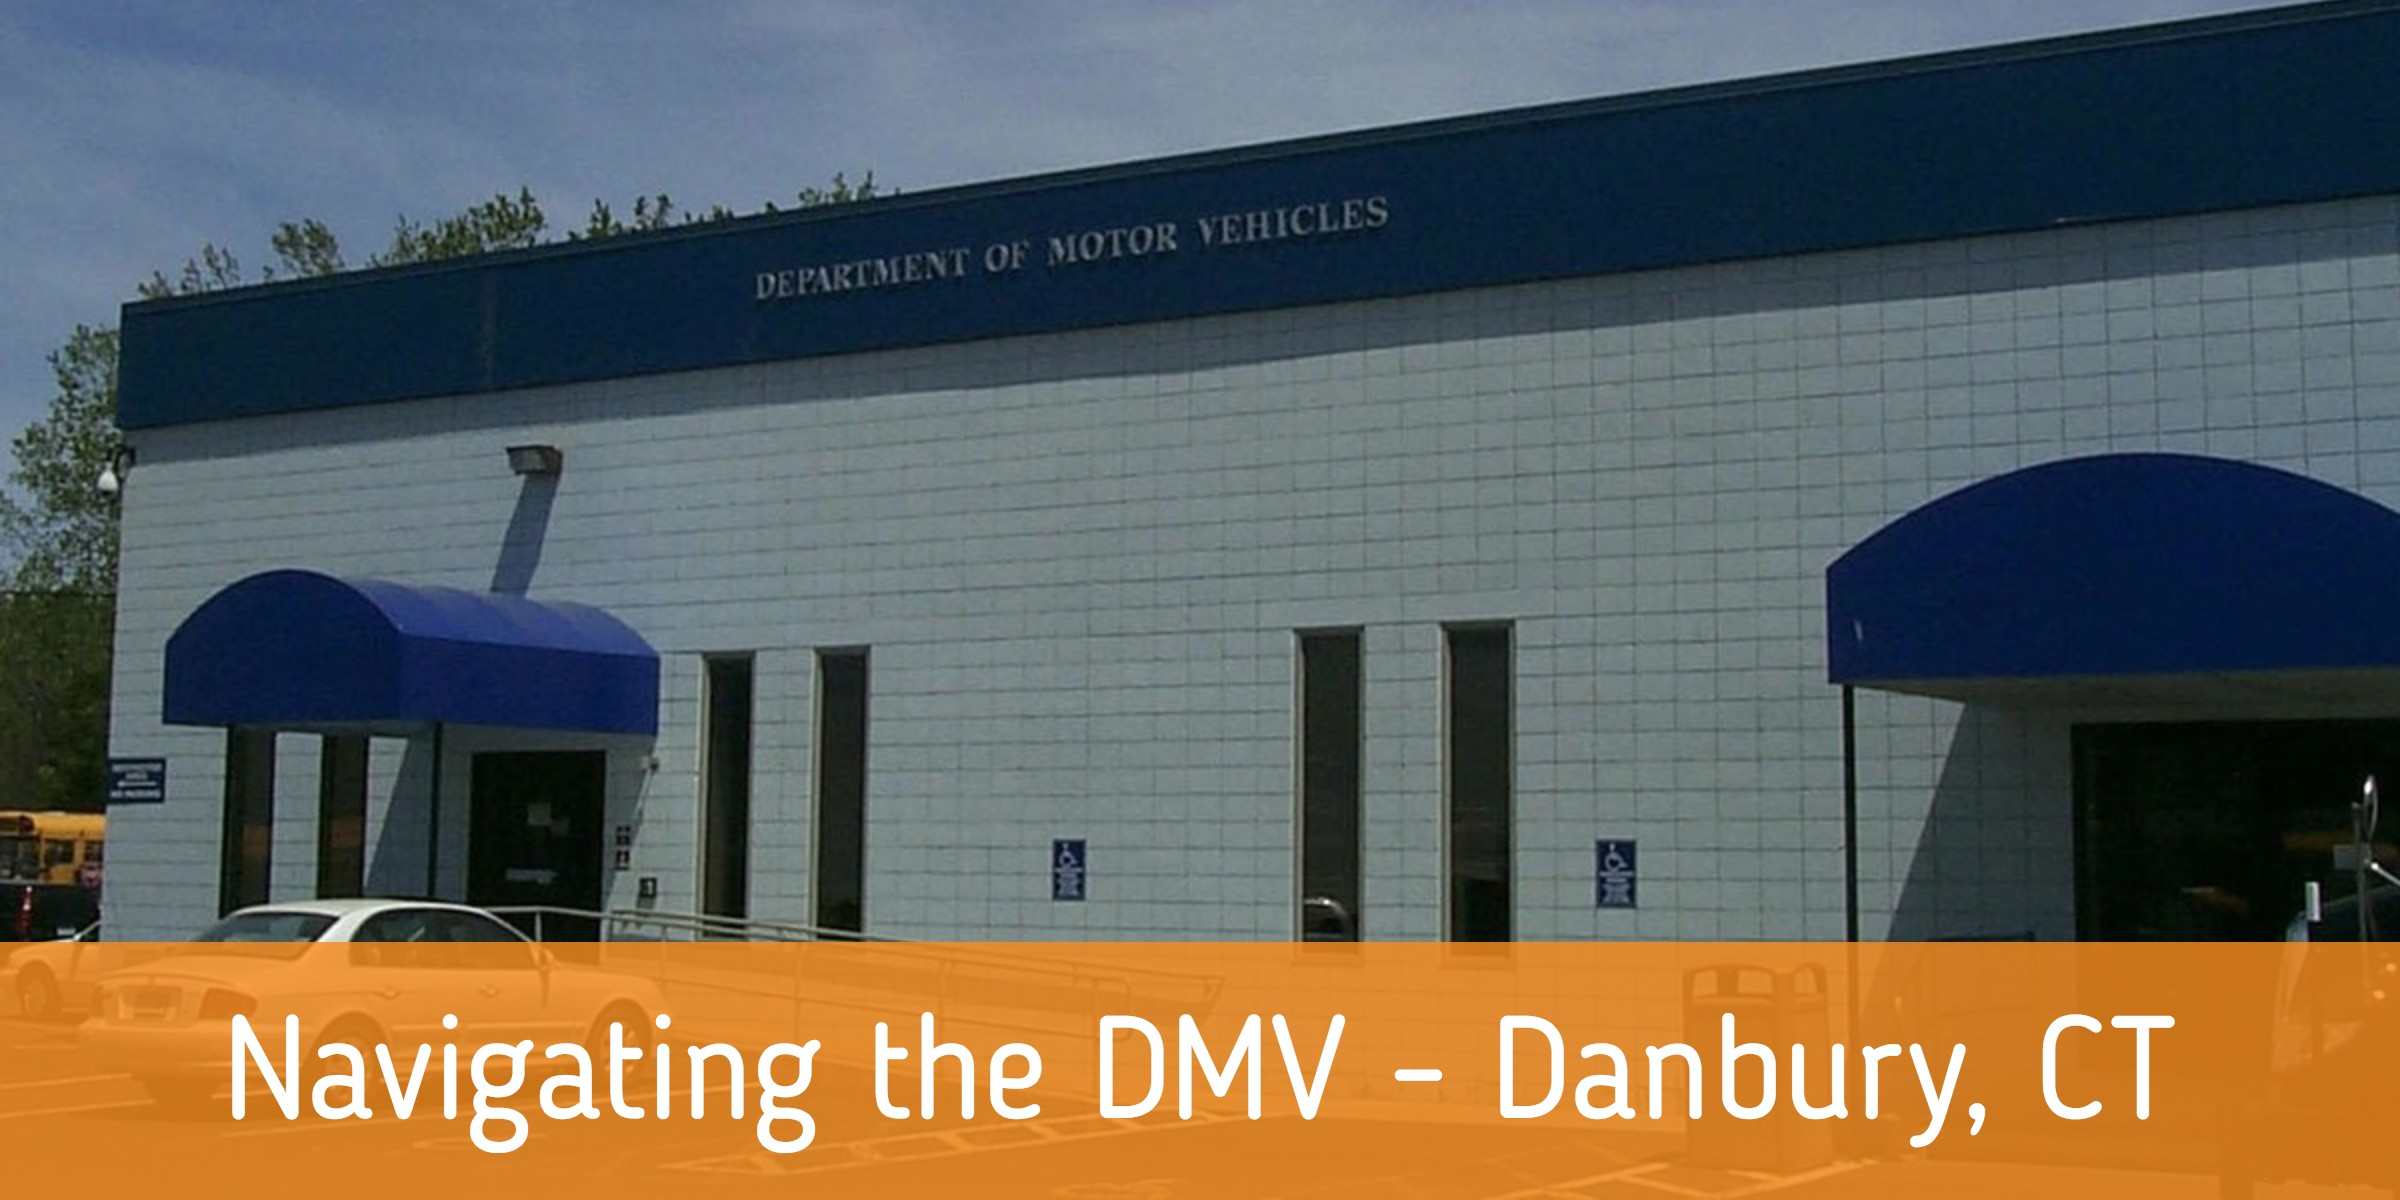 Navigating_the_DMV_-_Danbury_CT.jpg